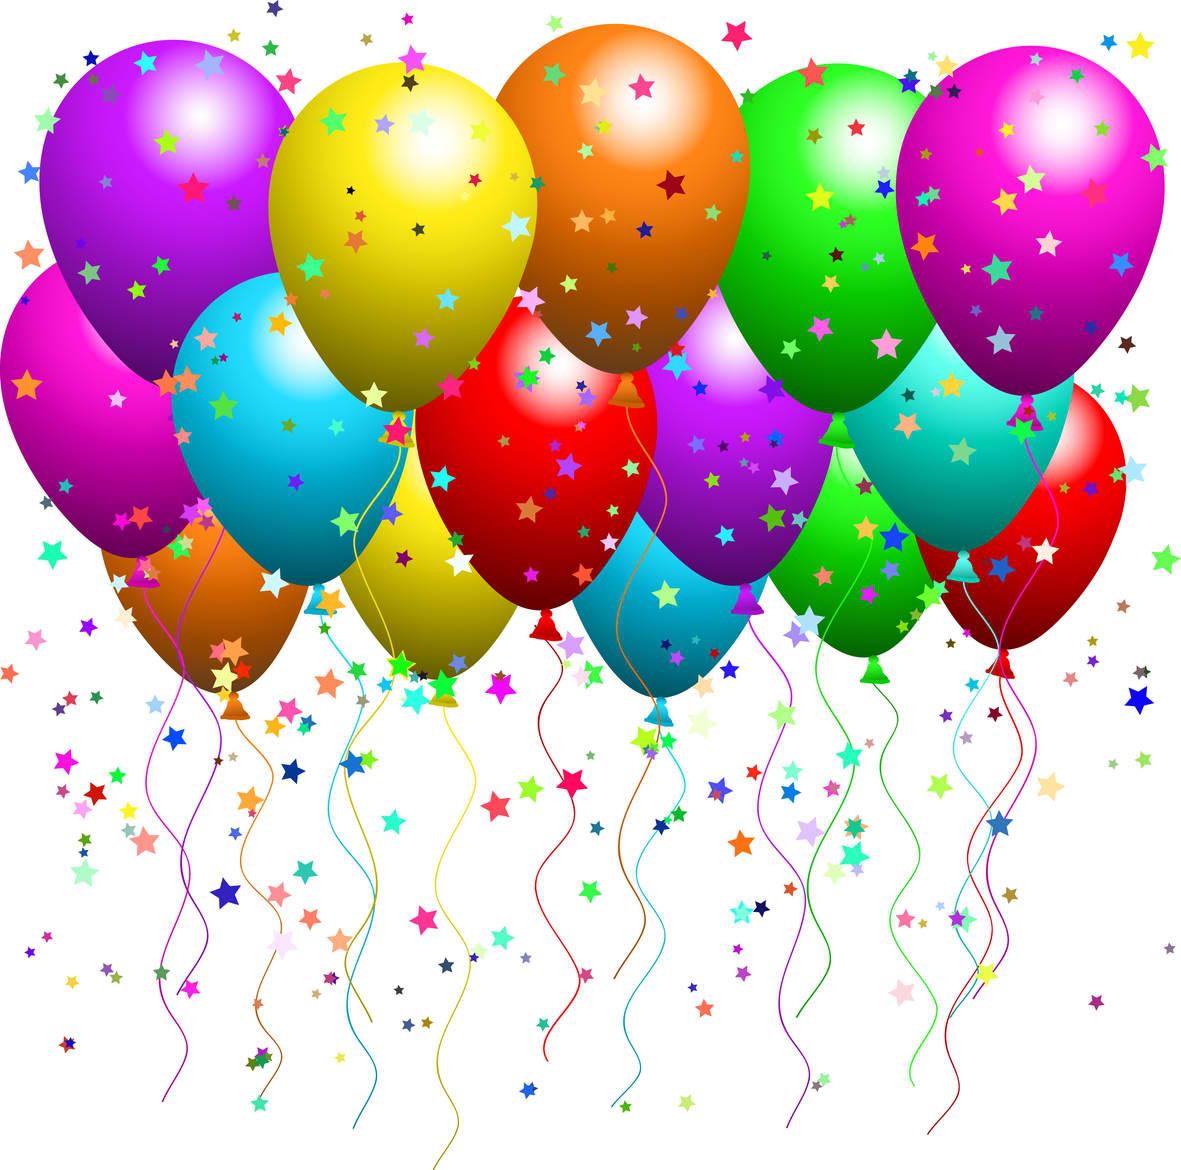 Free Birthday Birthday Clipart .-Free birthday birthday clipart .-5